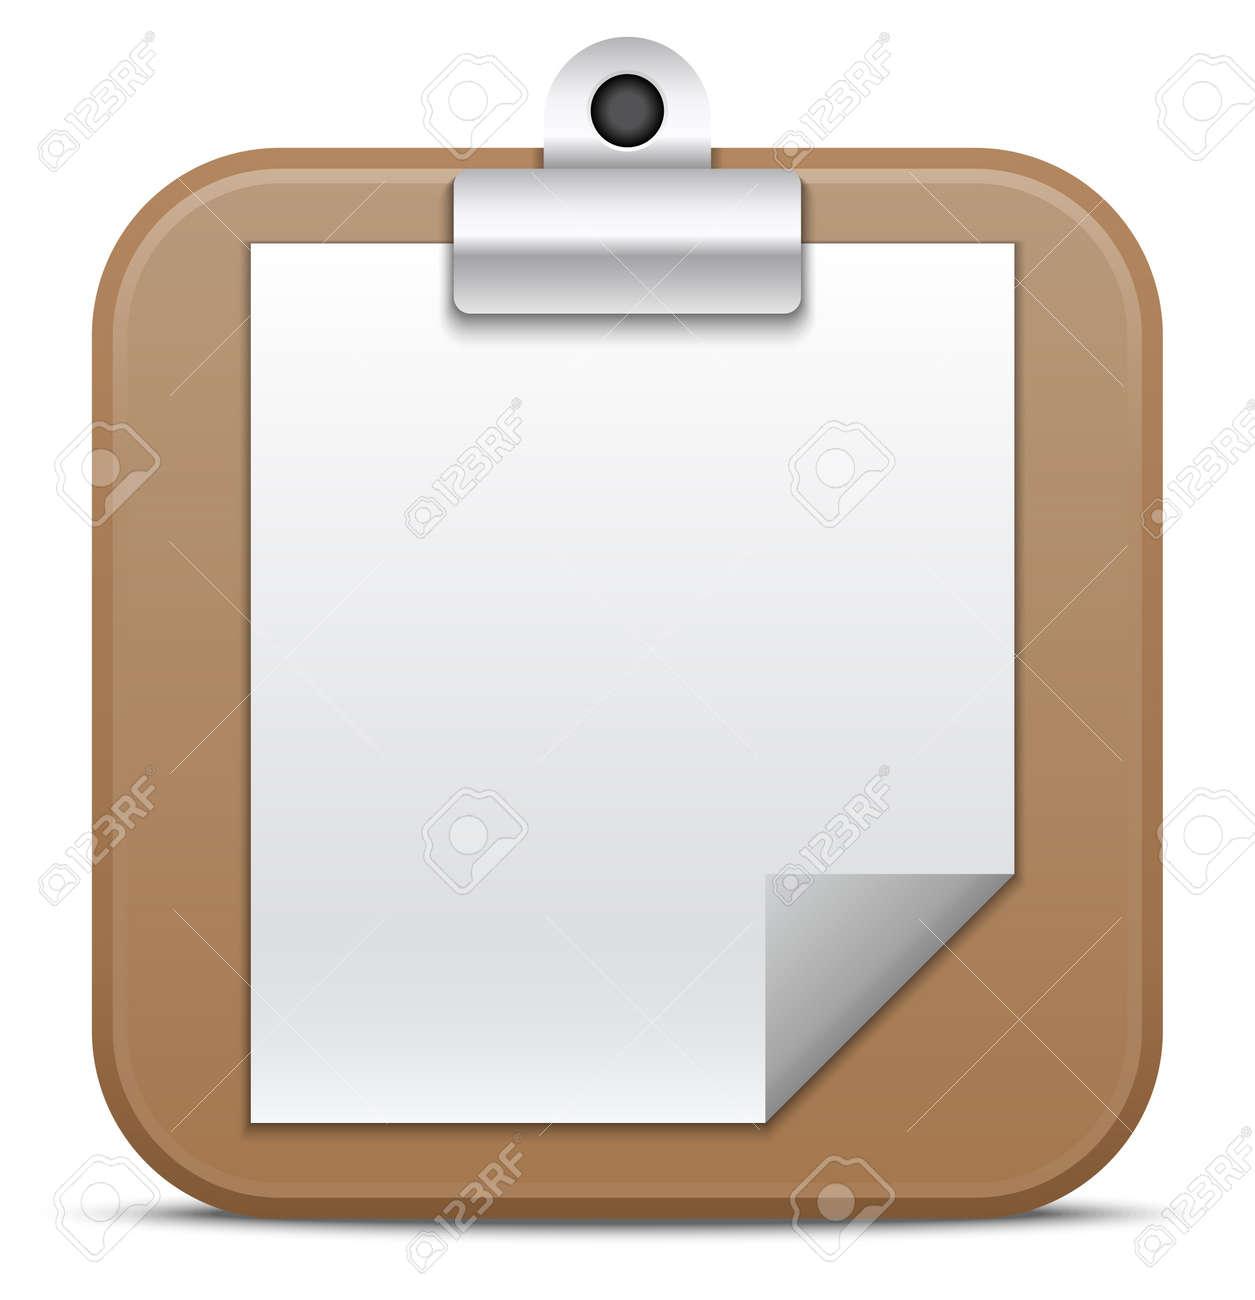 Clipboard icon  Vector illustration Stock Vector - 21139325